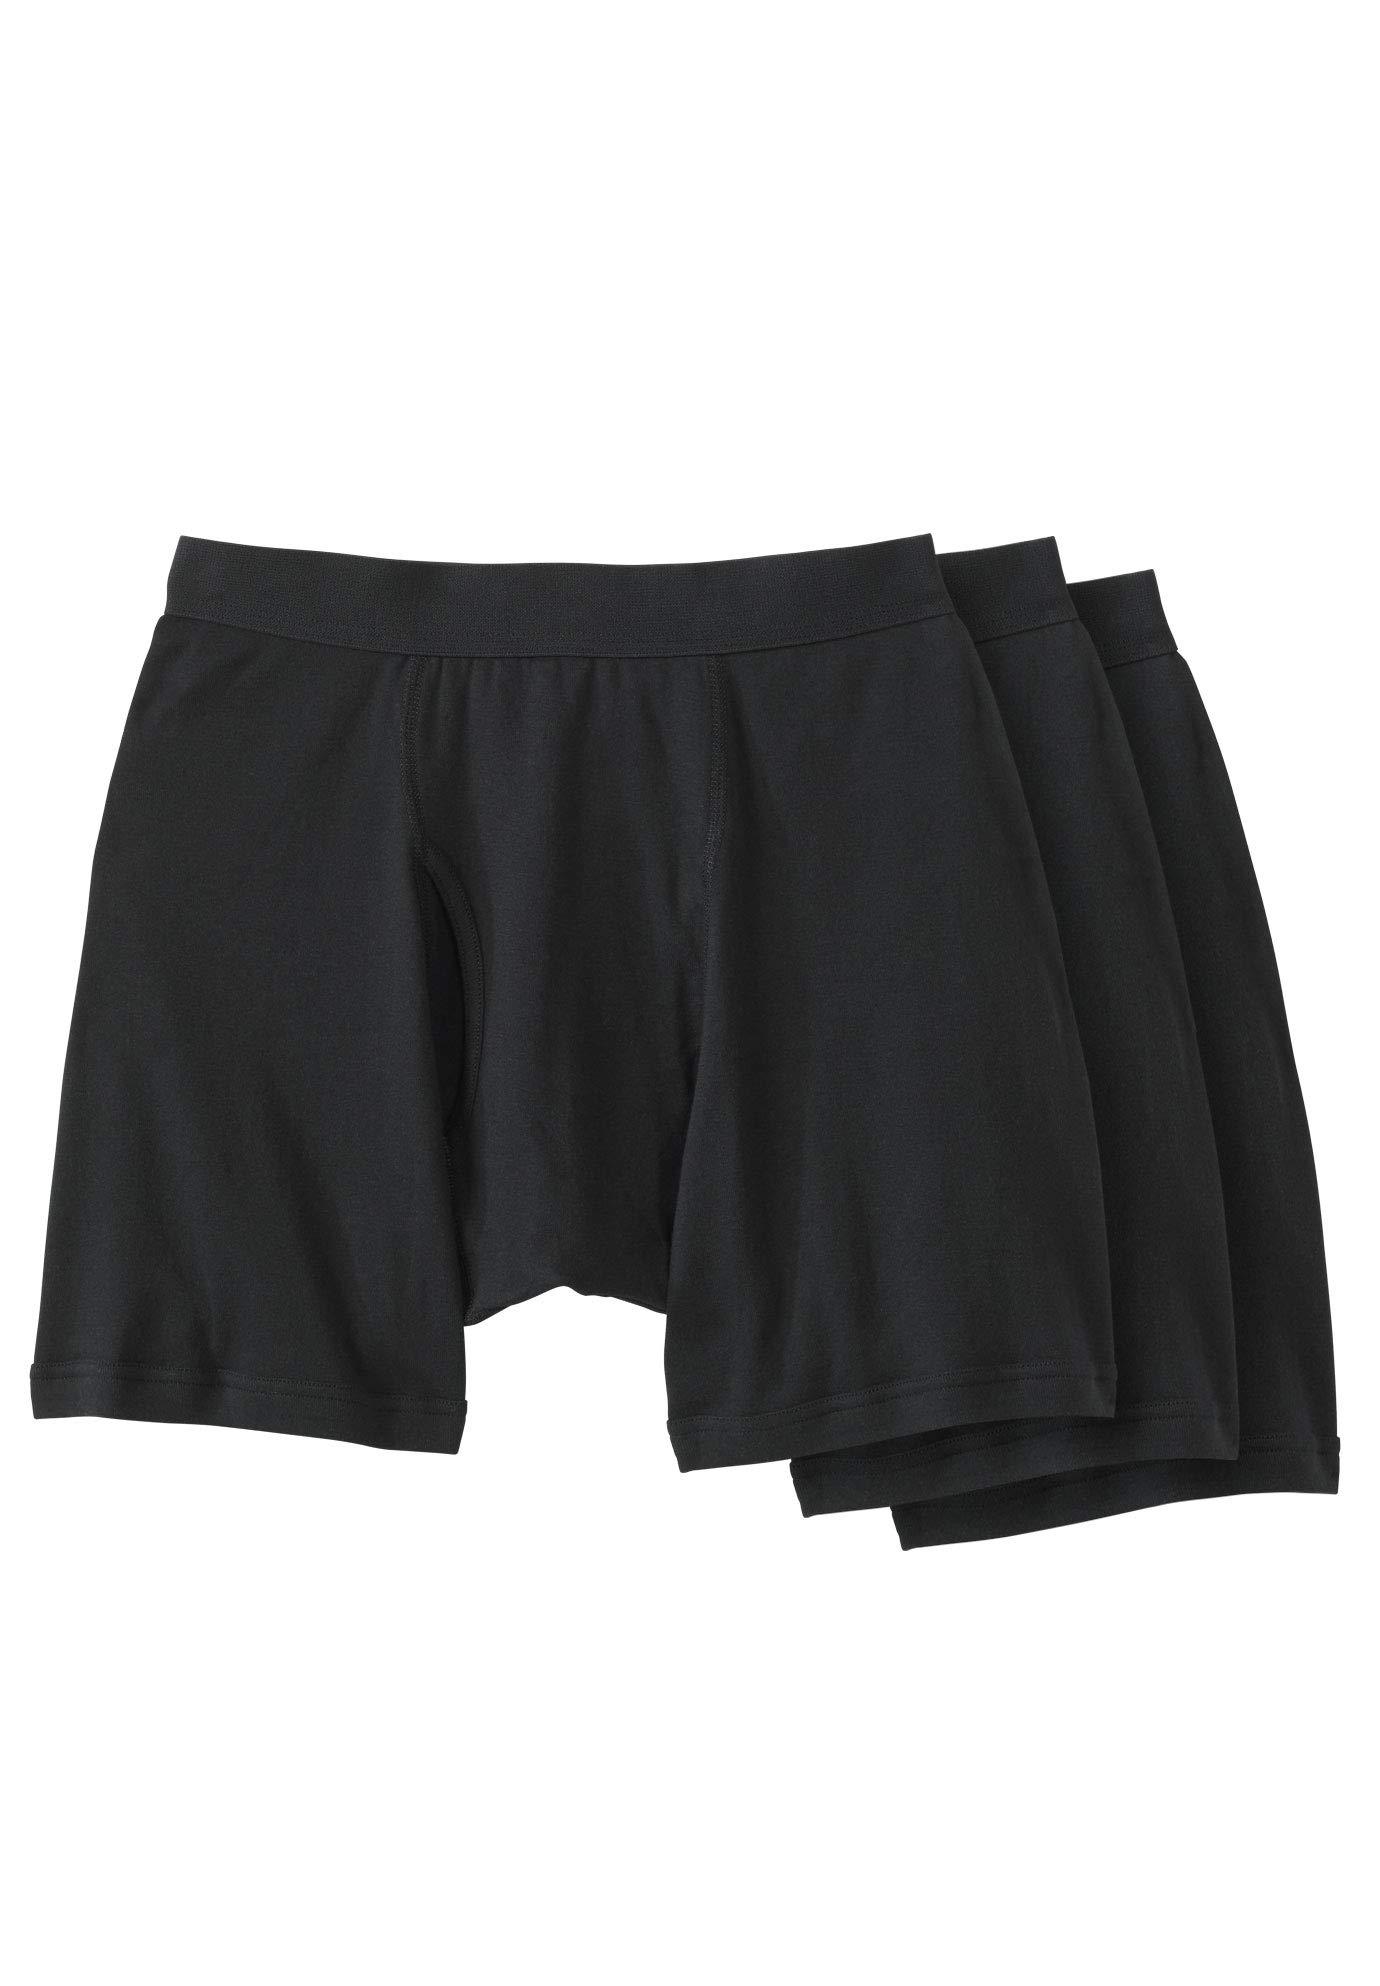 KingSize Men's Big & Tall Cotton Cycle Briefs 3-Pack, Black Big-4Xl